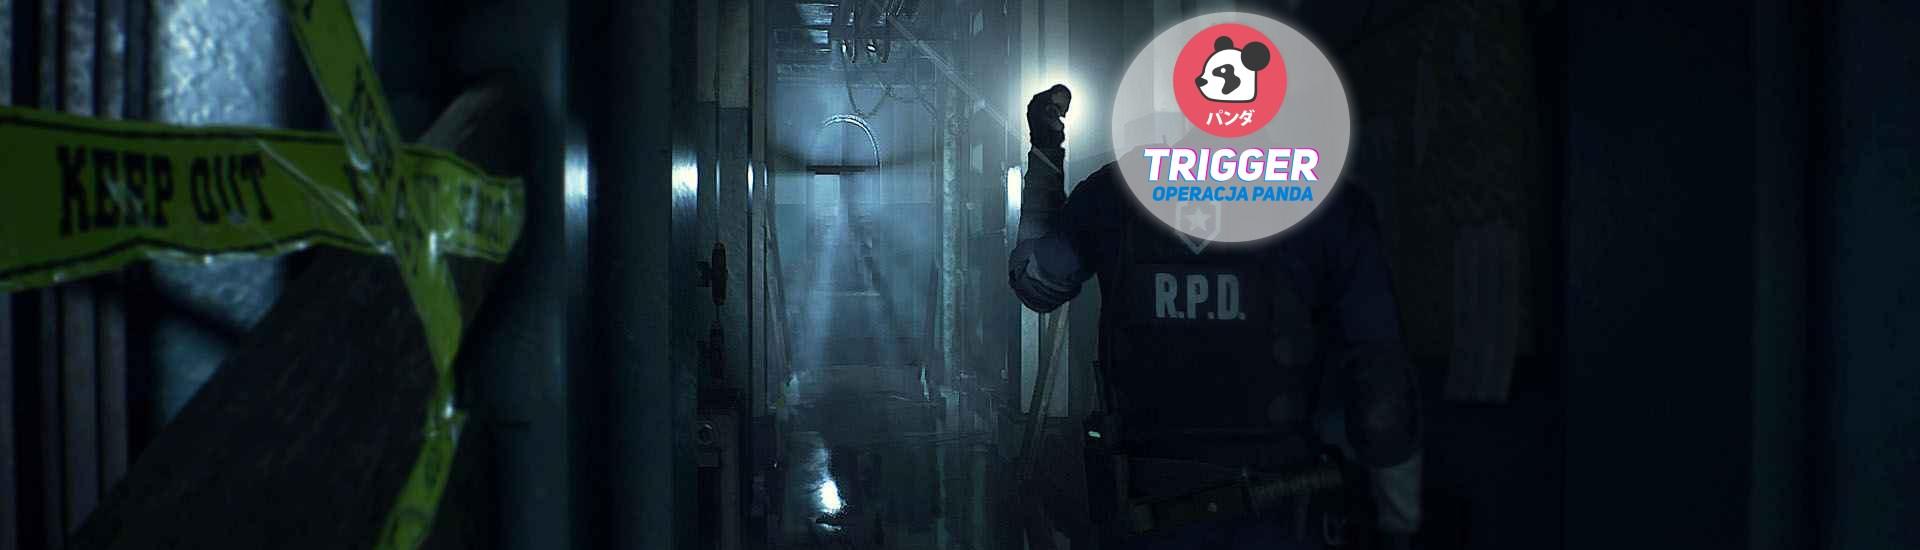 REsident Evil wzloty i upadki serii slider trigger